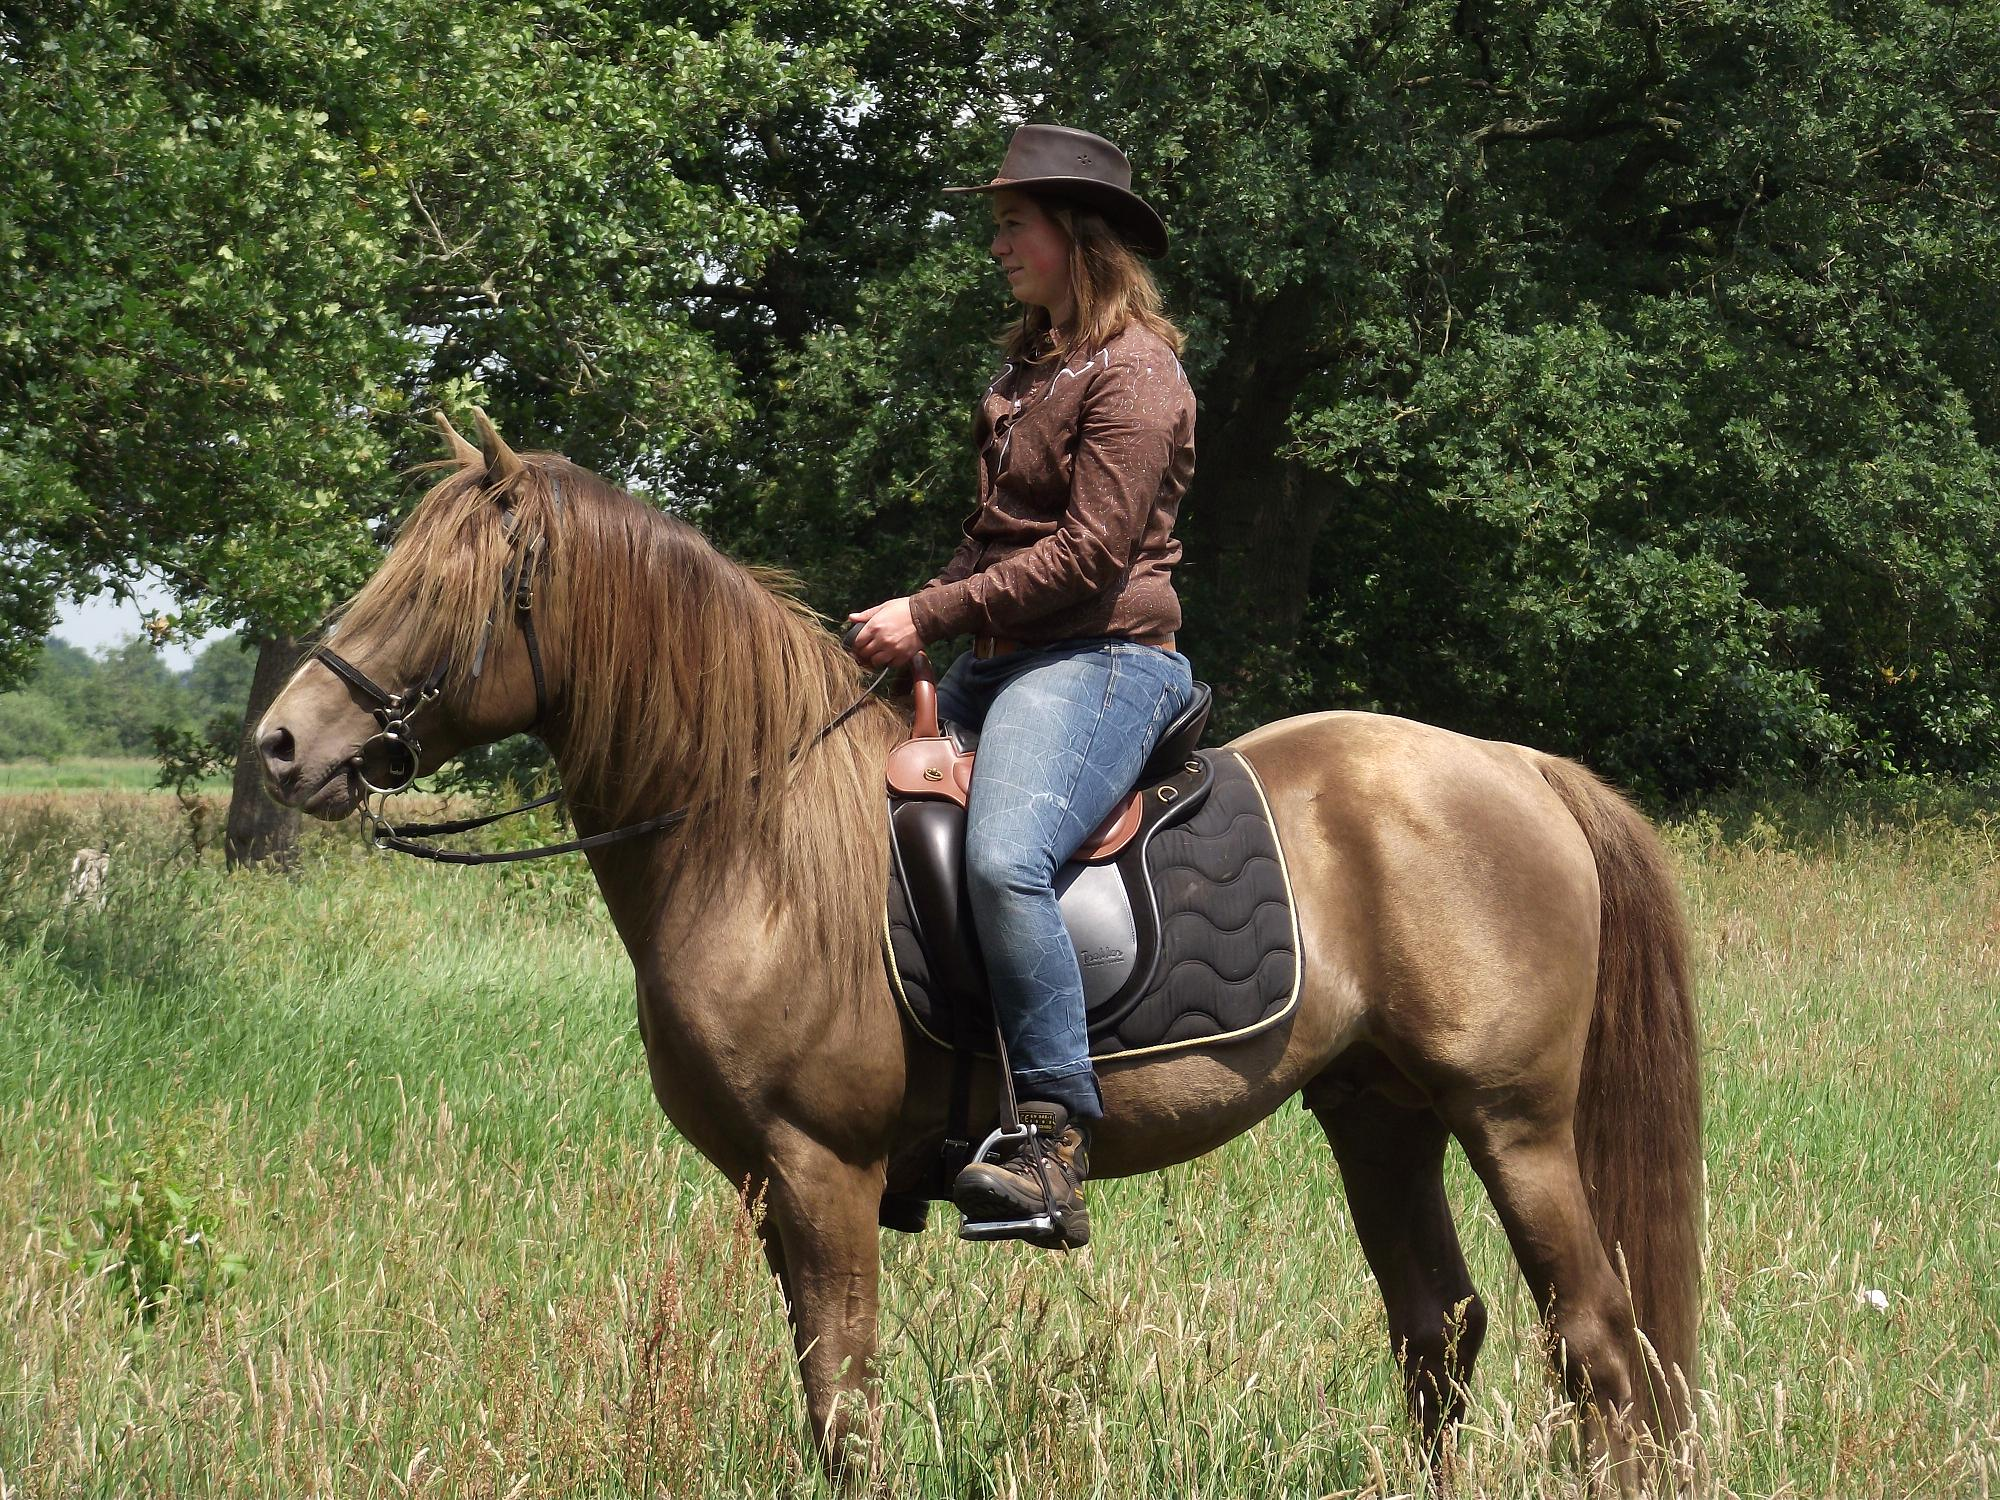 TER DEKKING: Rocky Mountain Horse 'Sam's Dusty Shadow' | Bokt.nl: www.bokt.nl/markt/ad/33223/ter-dekking-rocky-mountain-horse-sams...